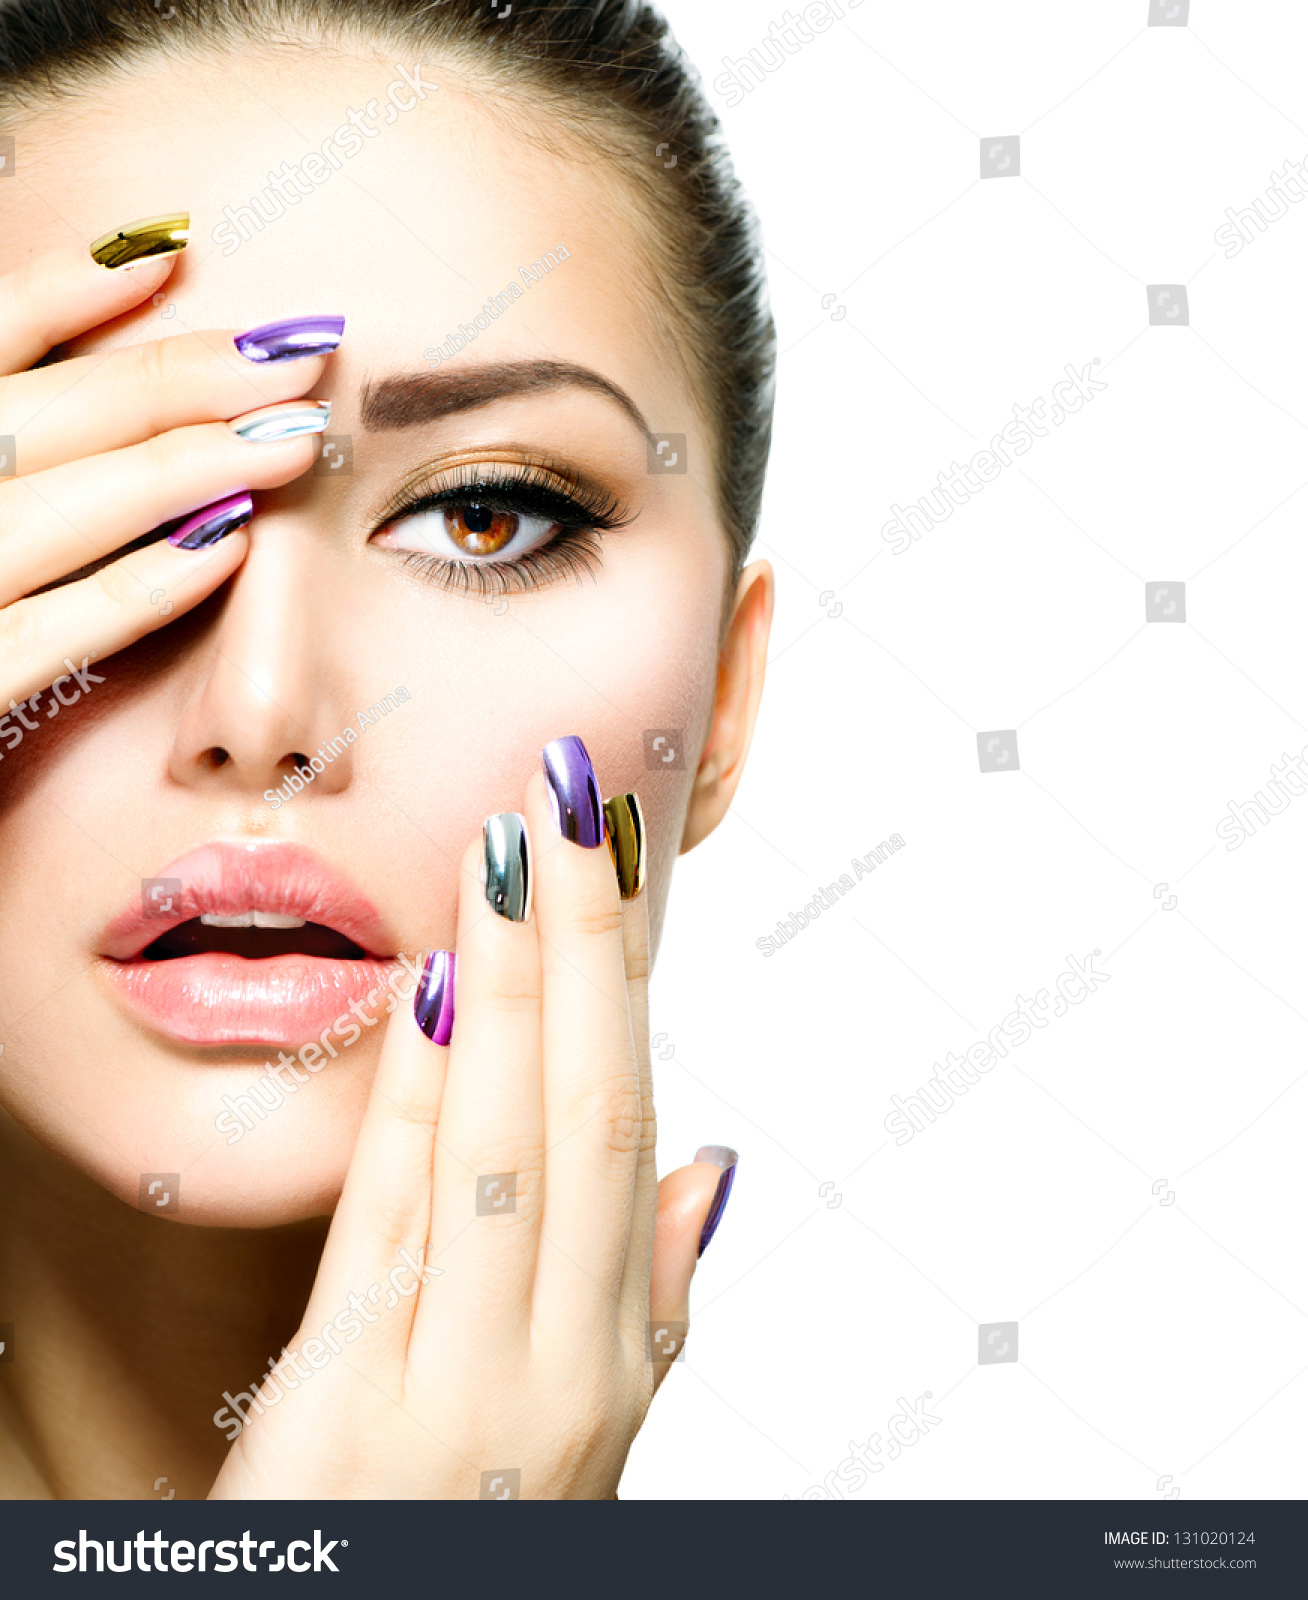 Beautiful Fashion Girls Face Makeup Makeup Stock Photo 131020124 - Shutterstock